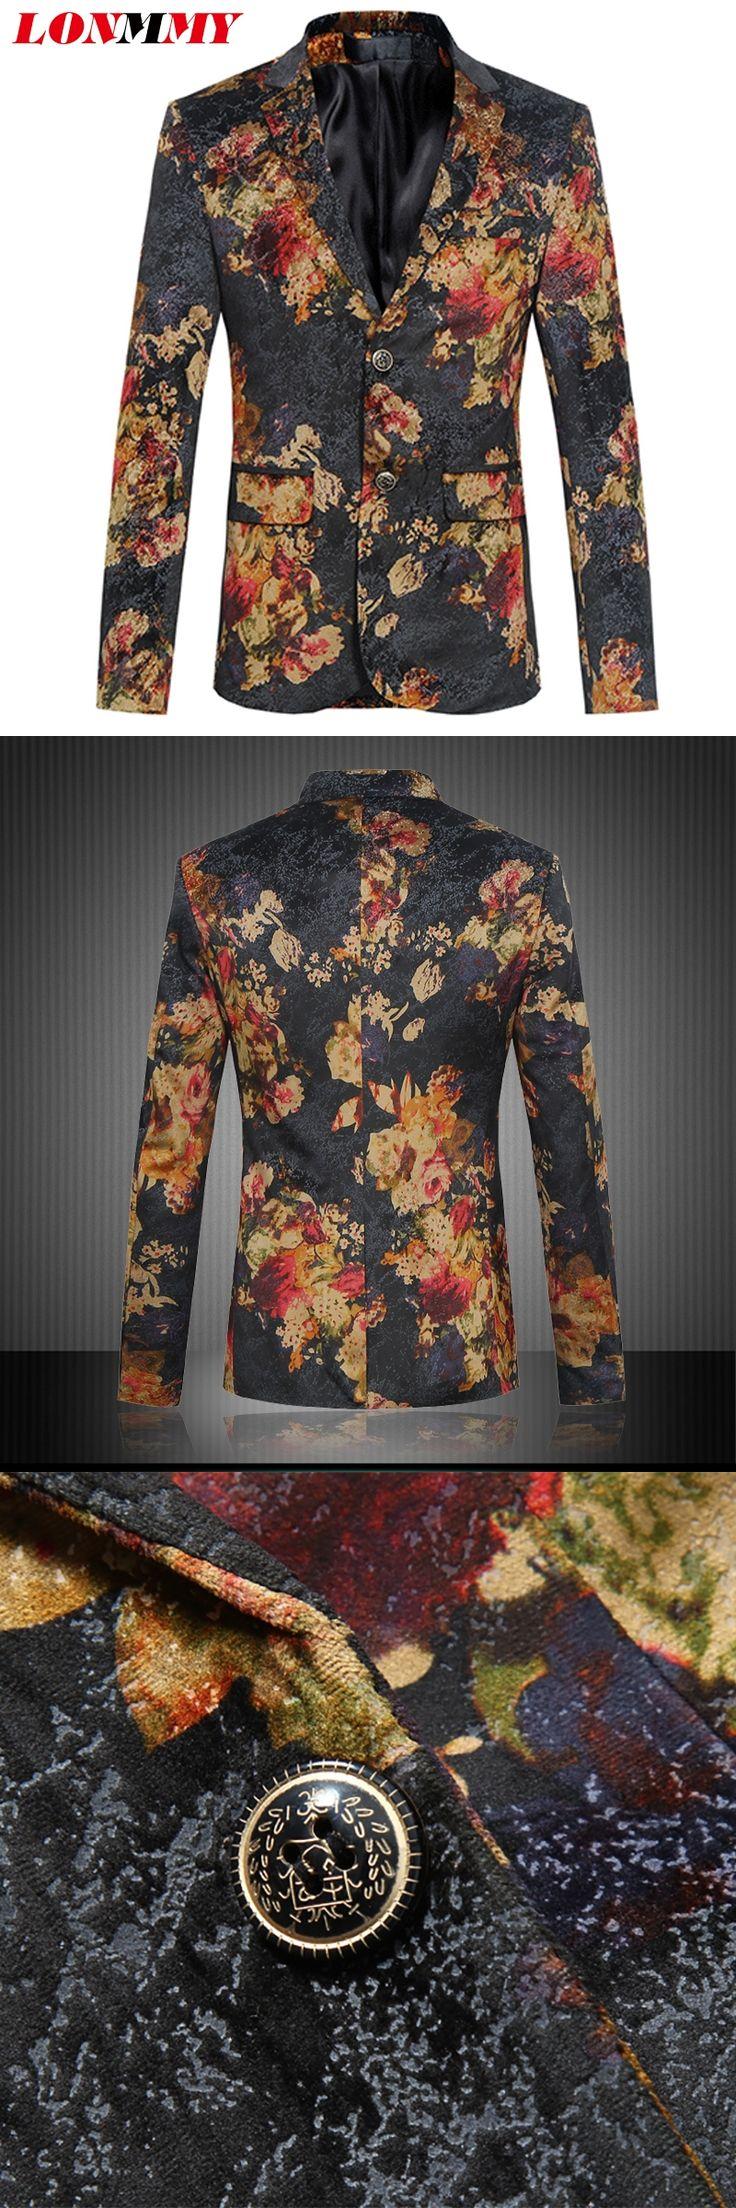 LONMMY M-6XL Mens floral blazer for men suit Slim fit mens blazer jacket flower suit men wedding dress 2017 New brand-clothing